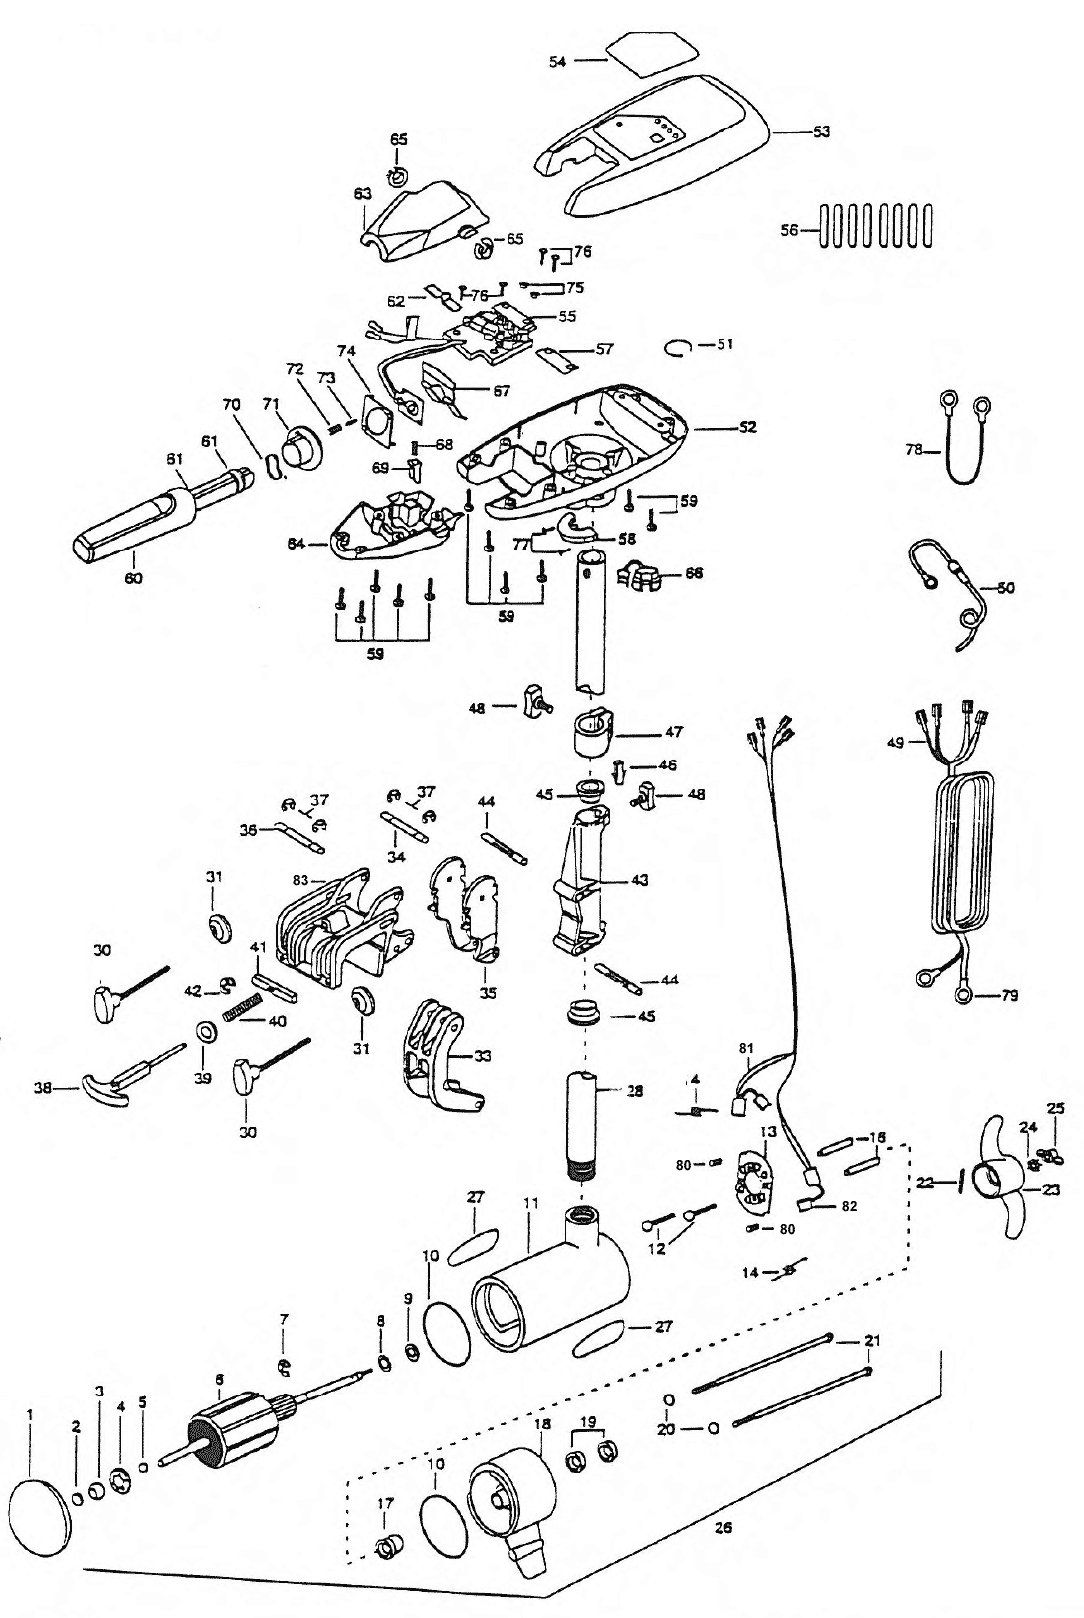 minn kota riptide 55s parts 1998 from. Black Bedroom Furniture Sets. Home Design Ideas